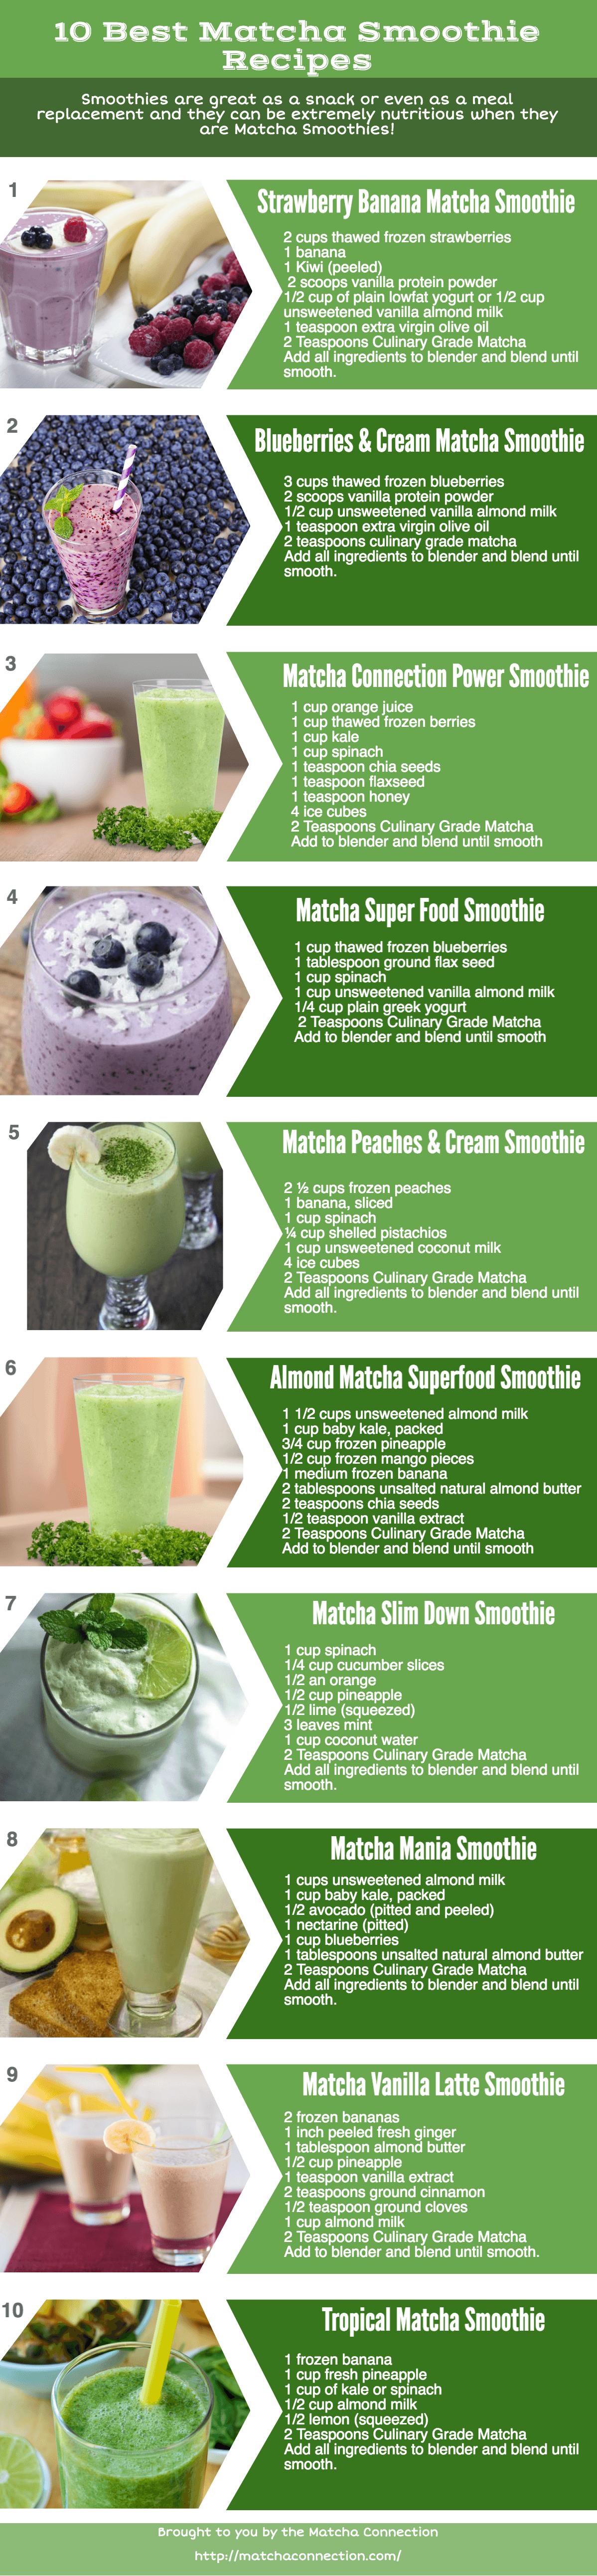 best matcha smoothies